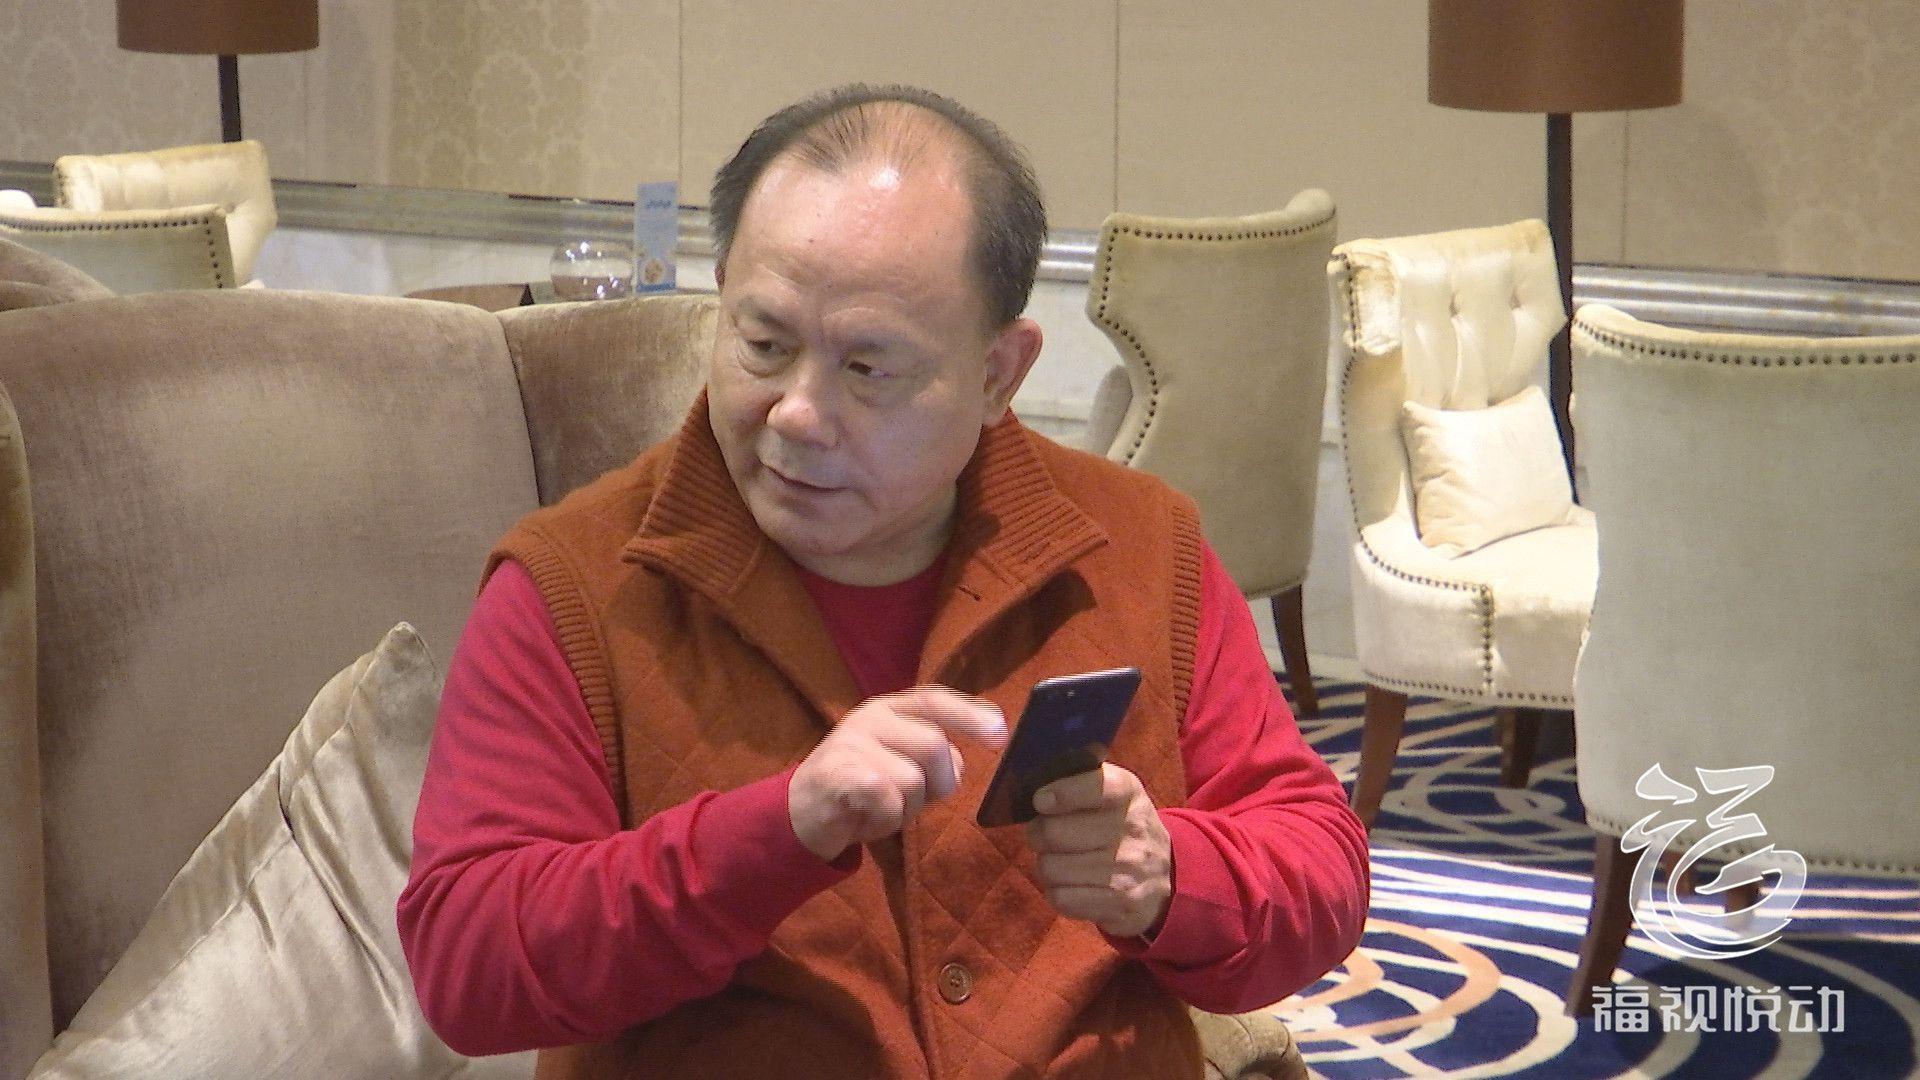 http://www.clzxc.com/changlejingji/16395.html